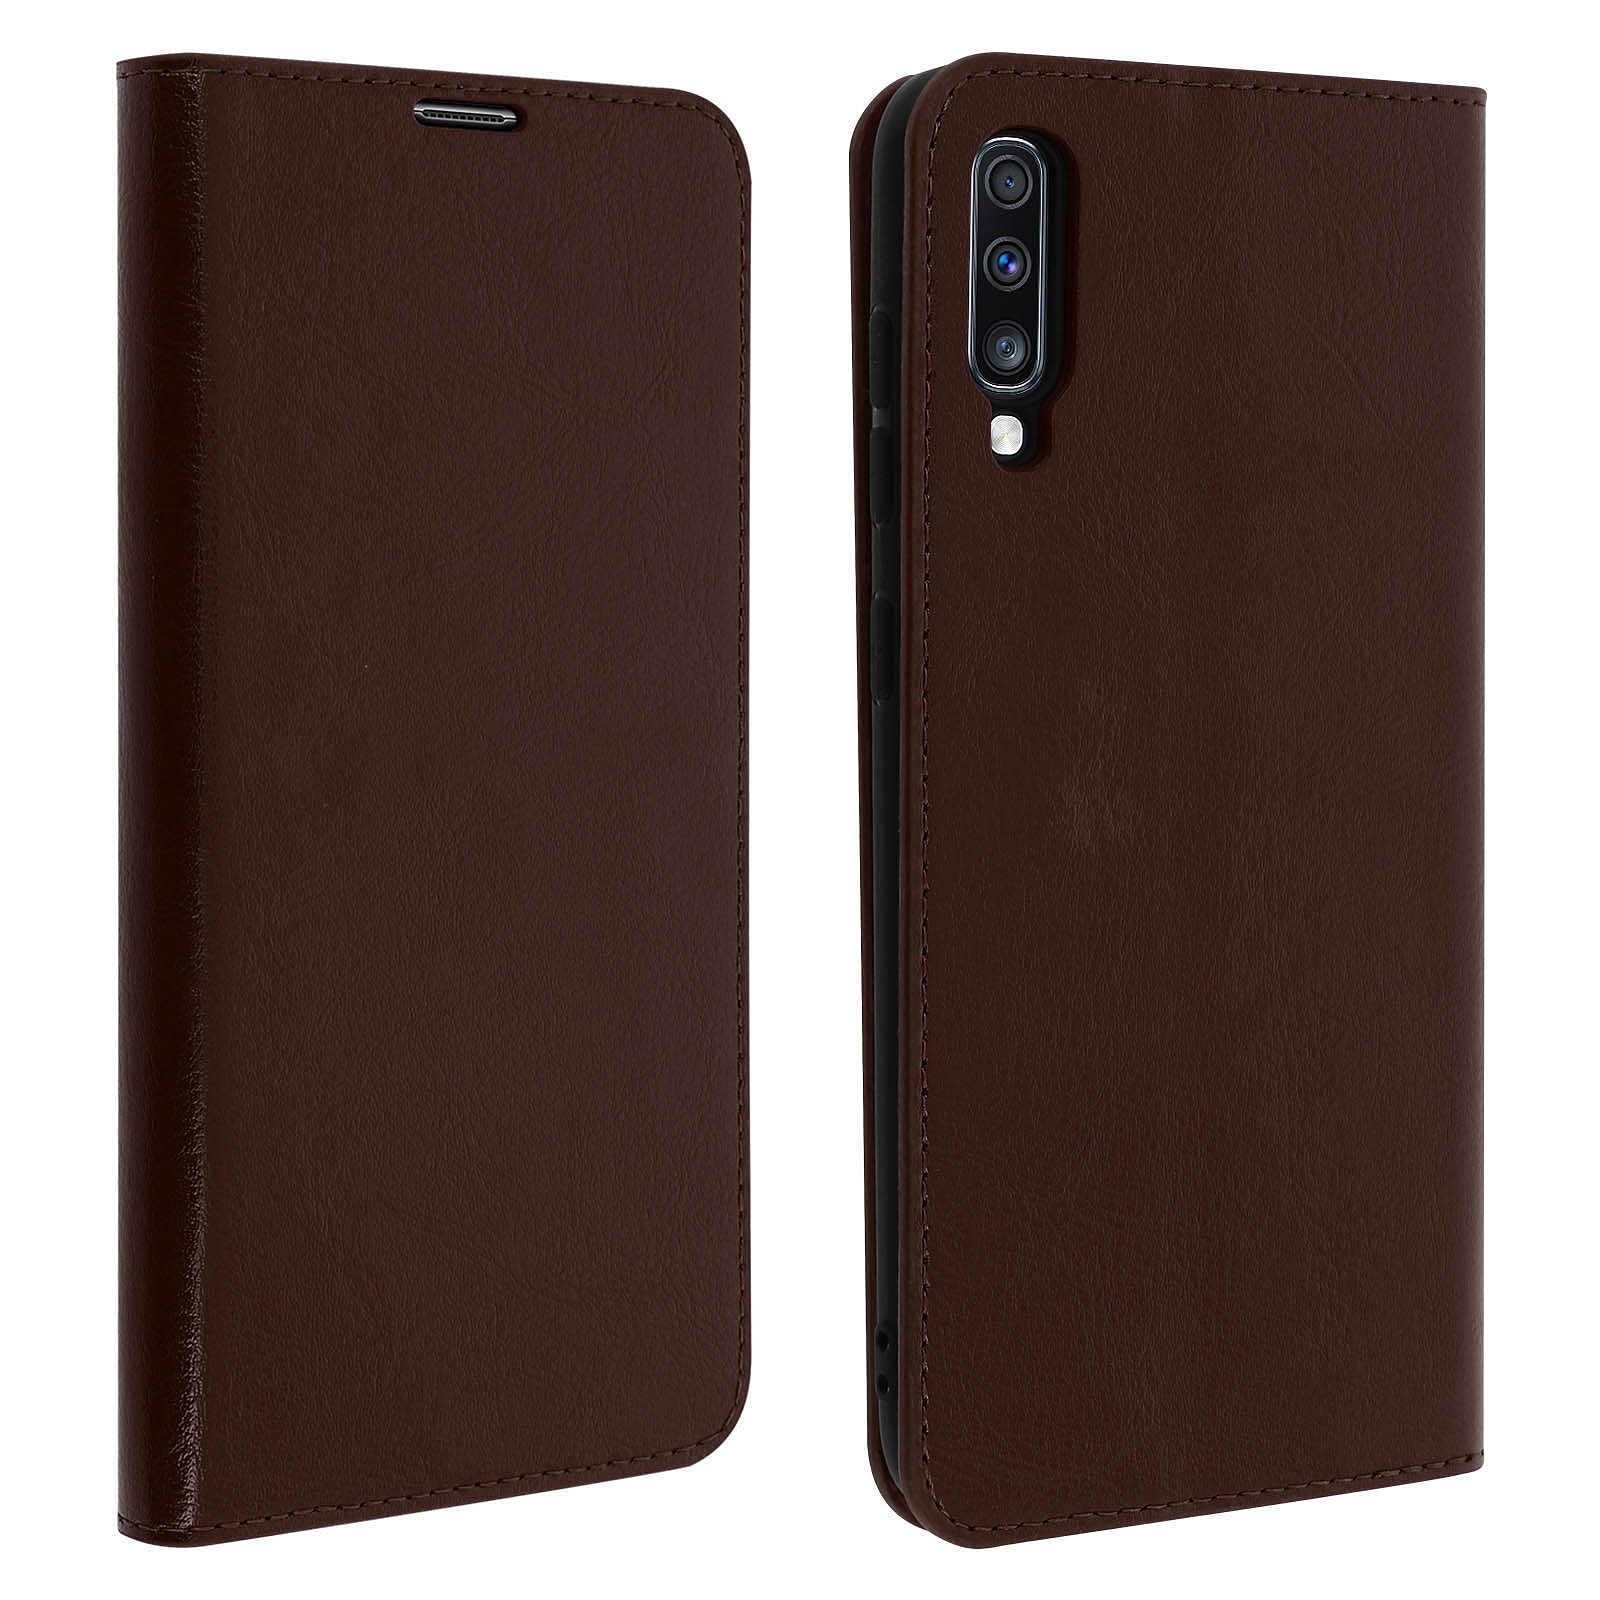 Avizar Etui folio Marron pour Samsung Galaxy A70